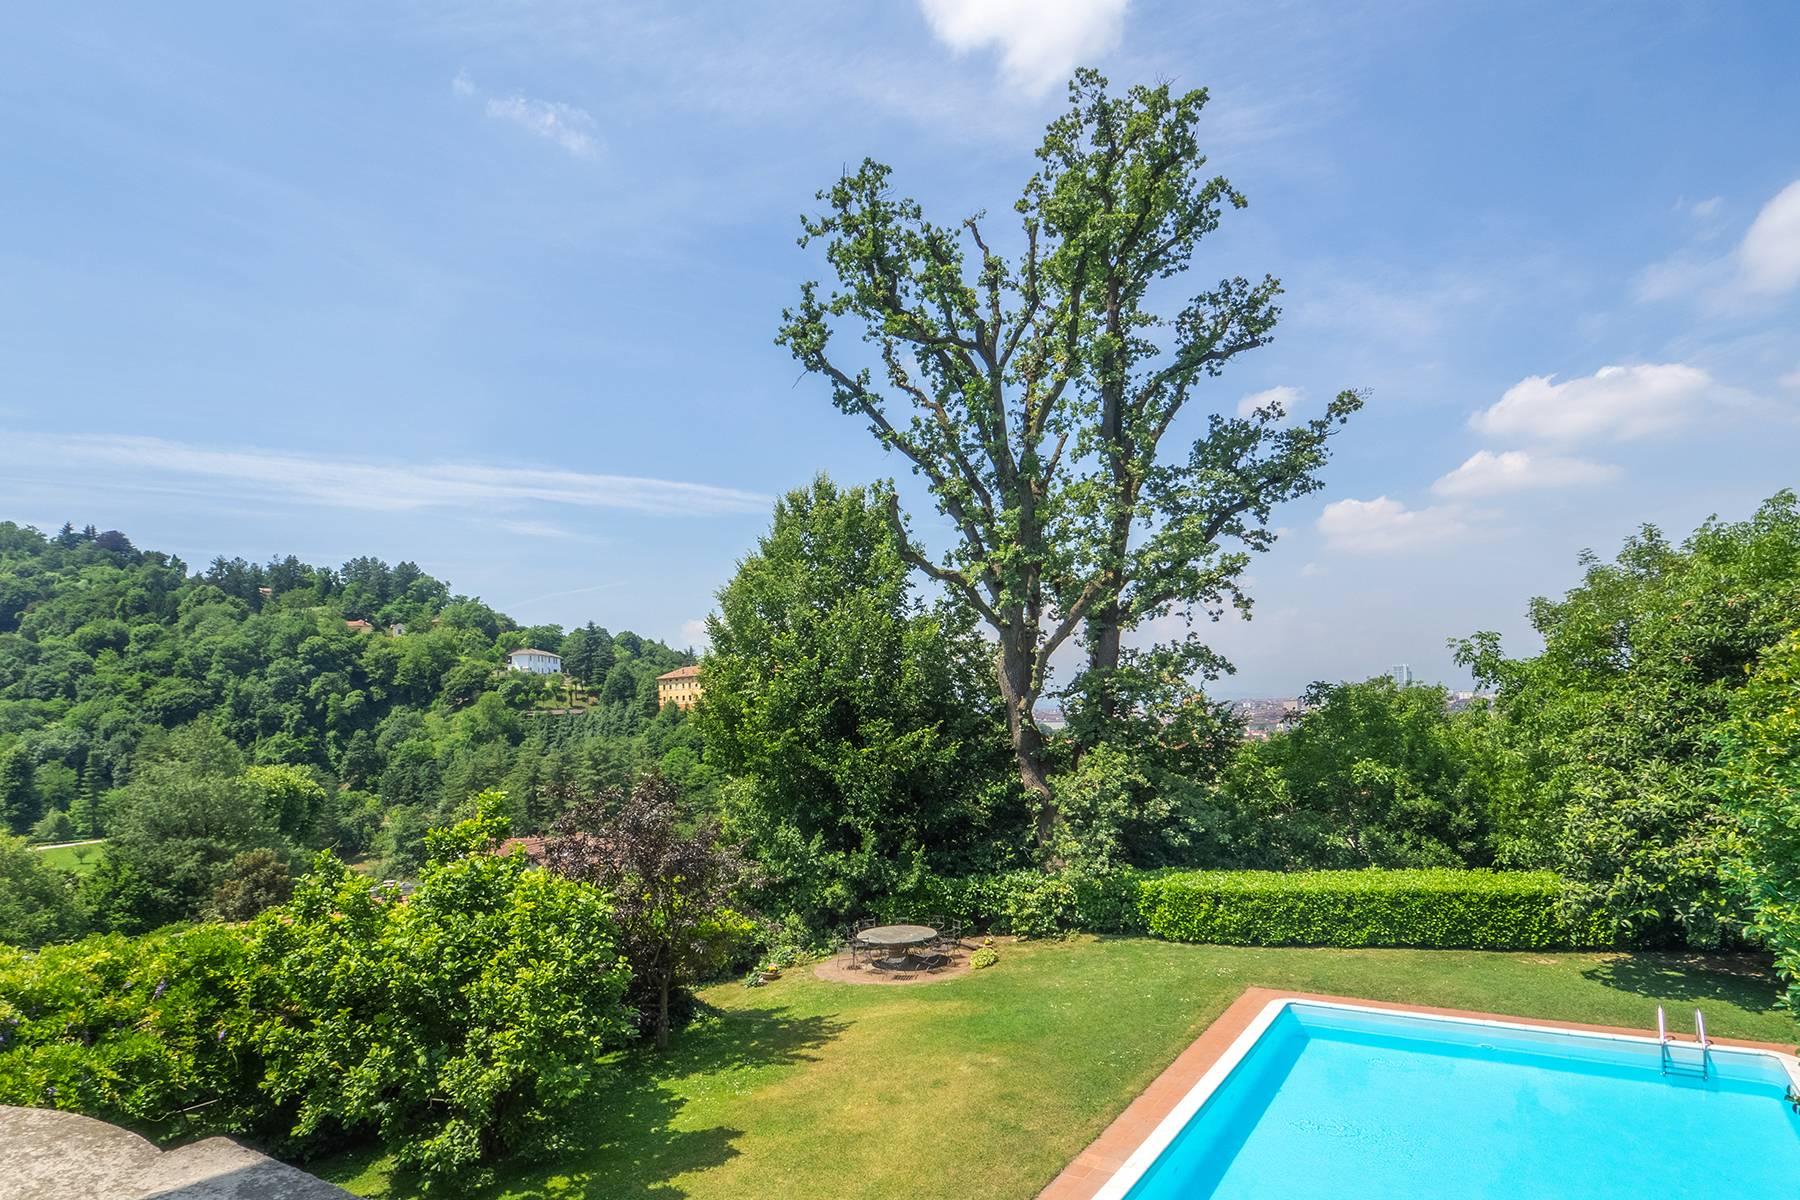 Casa indipendente in Vendita a Torino: 5 locali, 657 mq - Foto 17